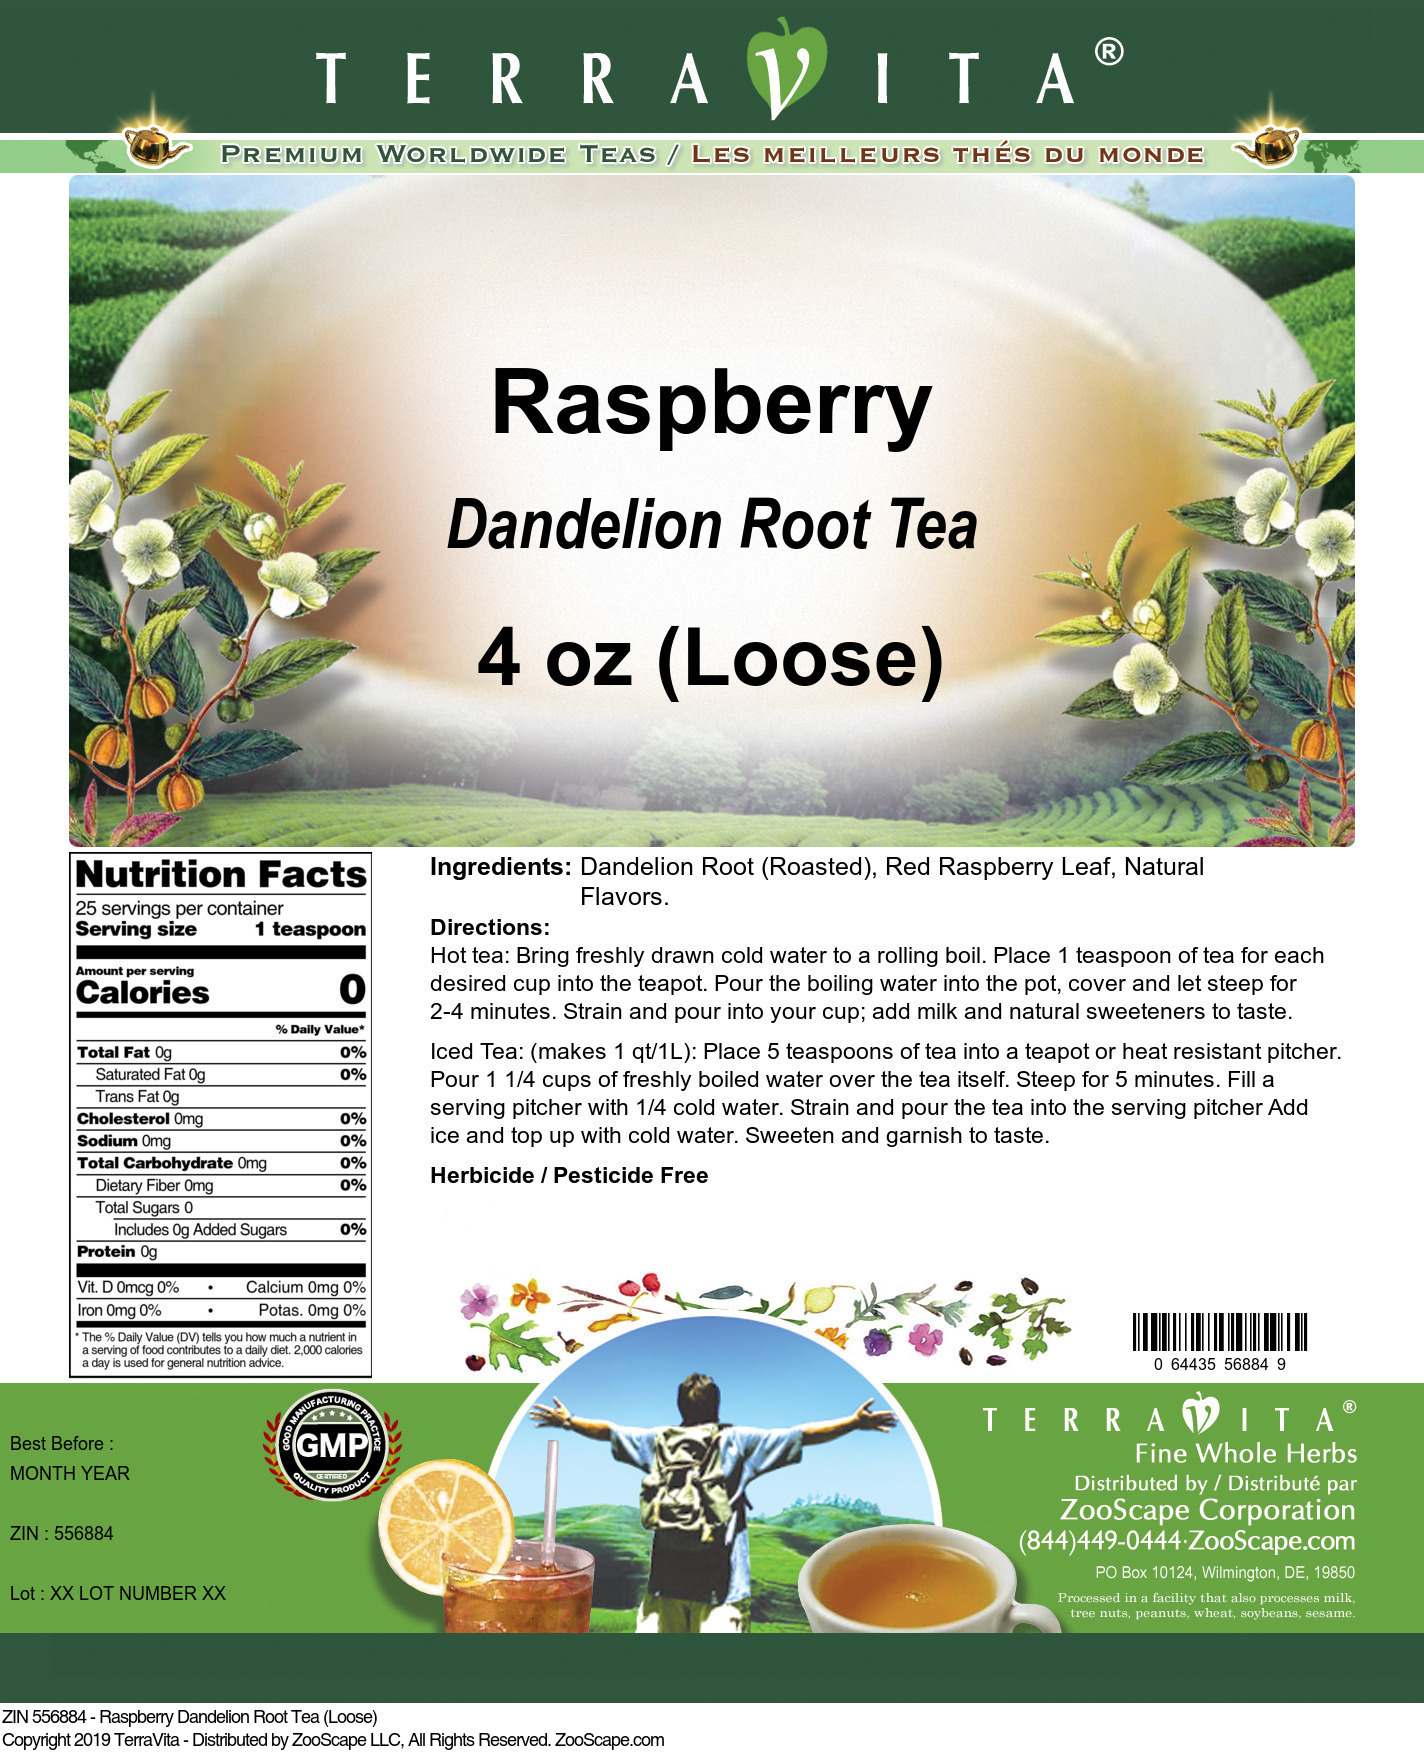 Raspberry Dandelion Root